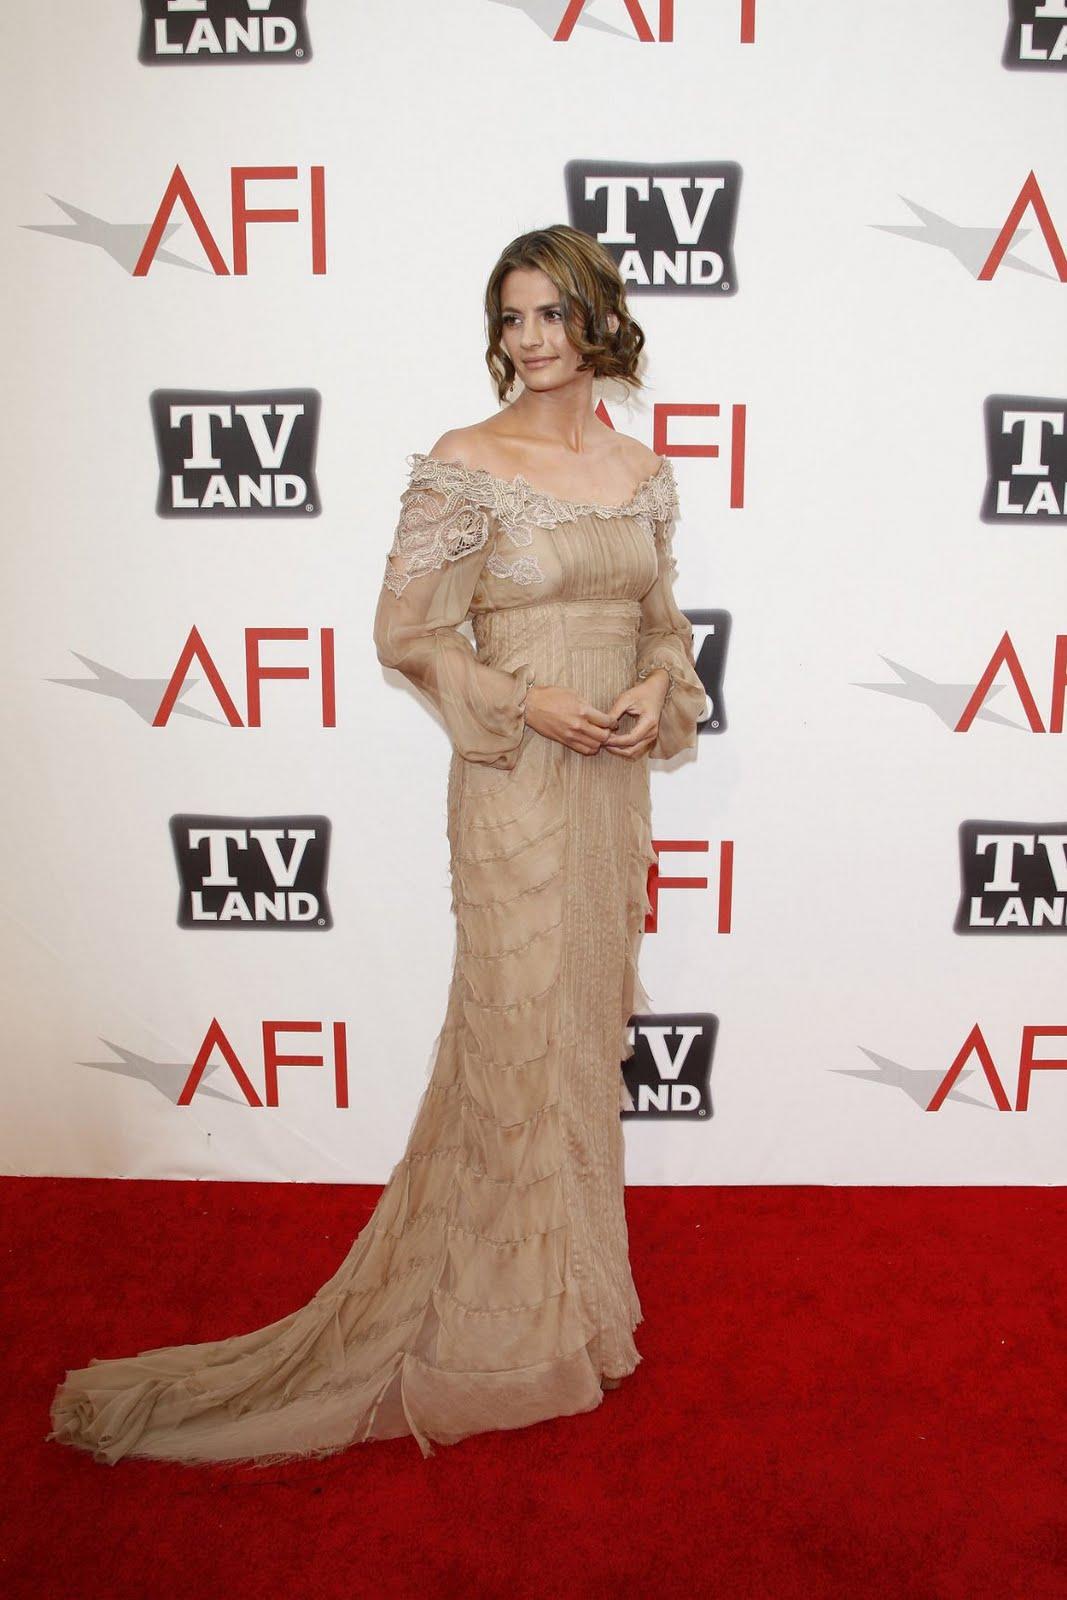 Stana Katic Photos Photos - 39th AFI Life Achievement